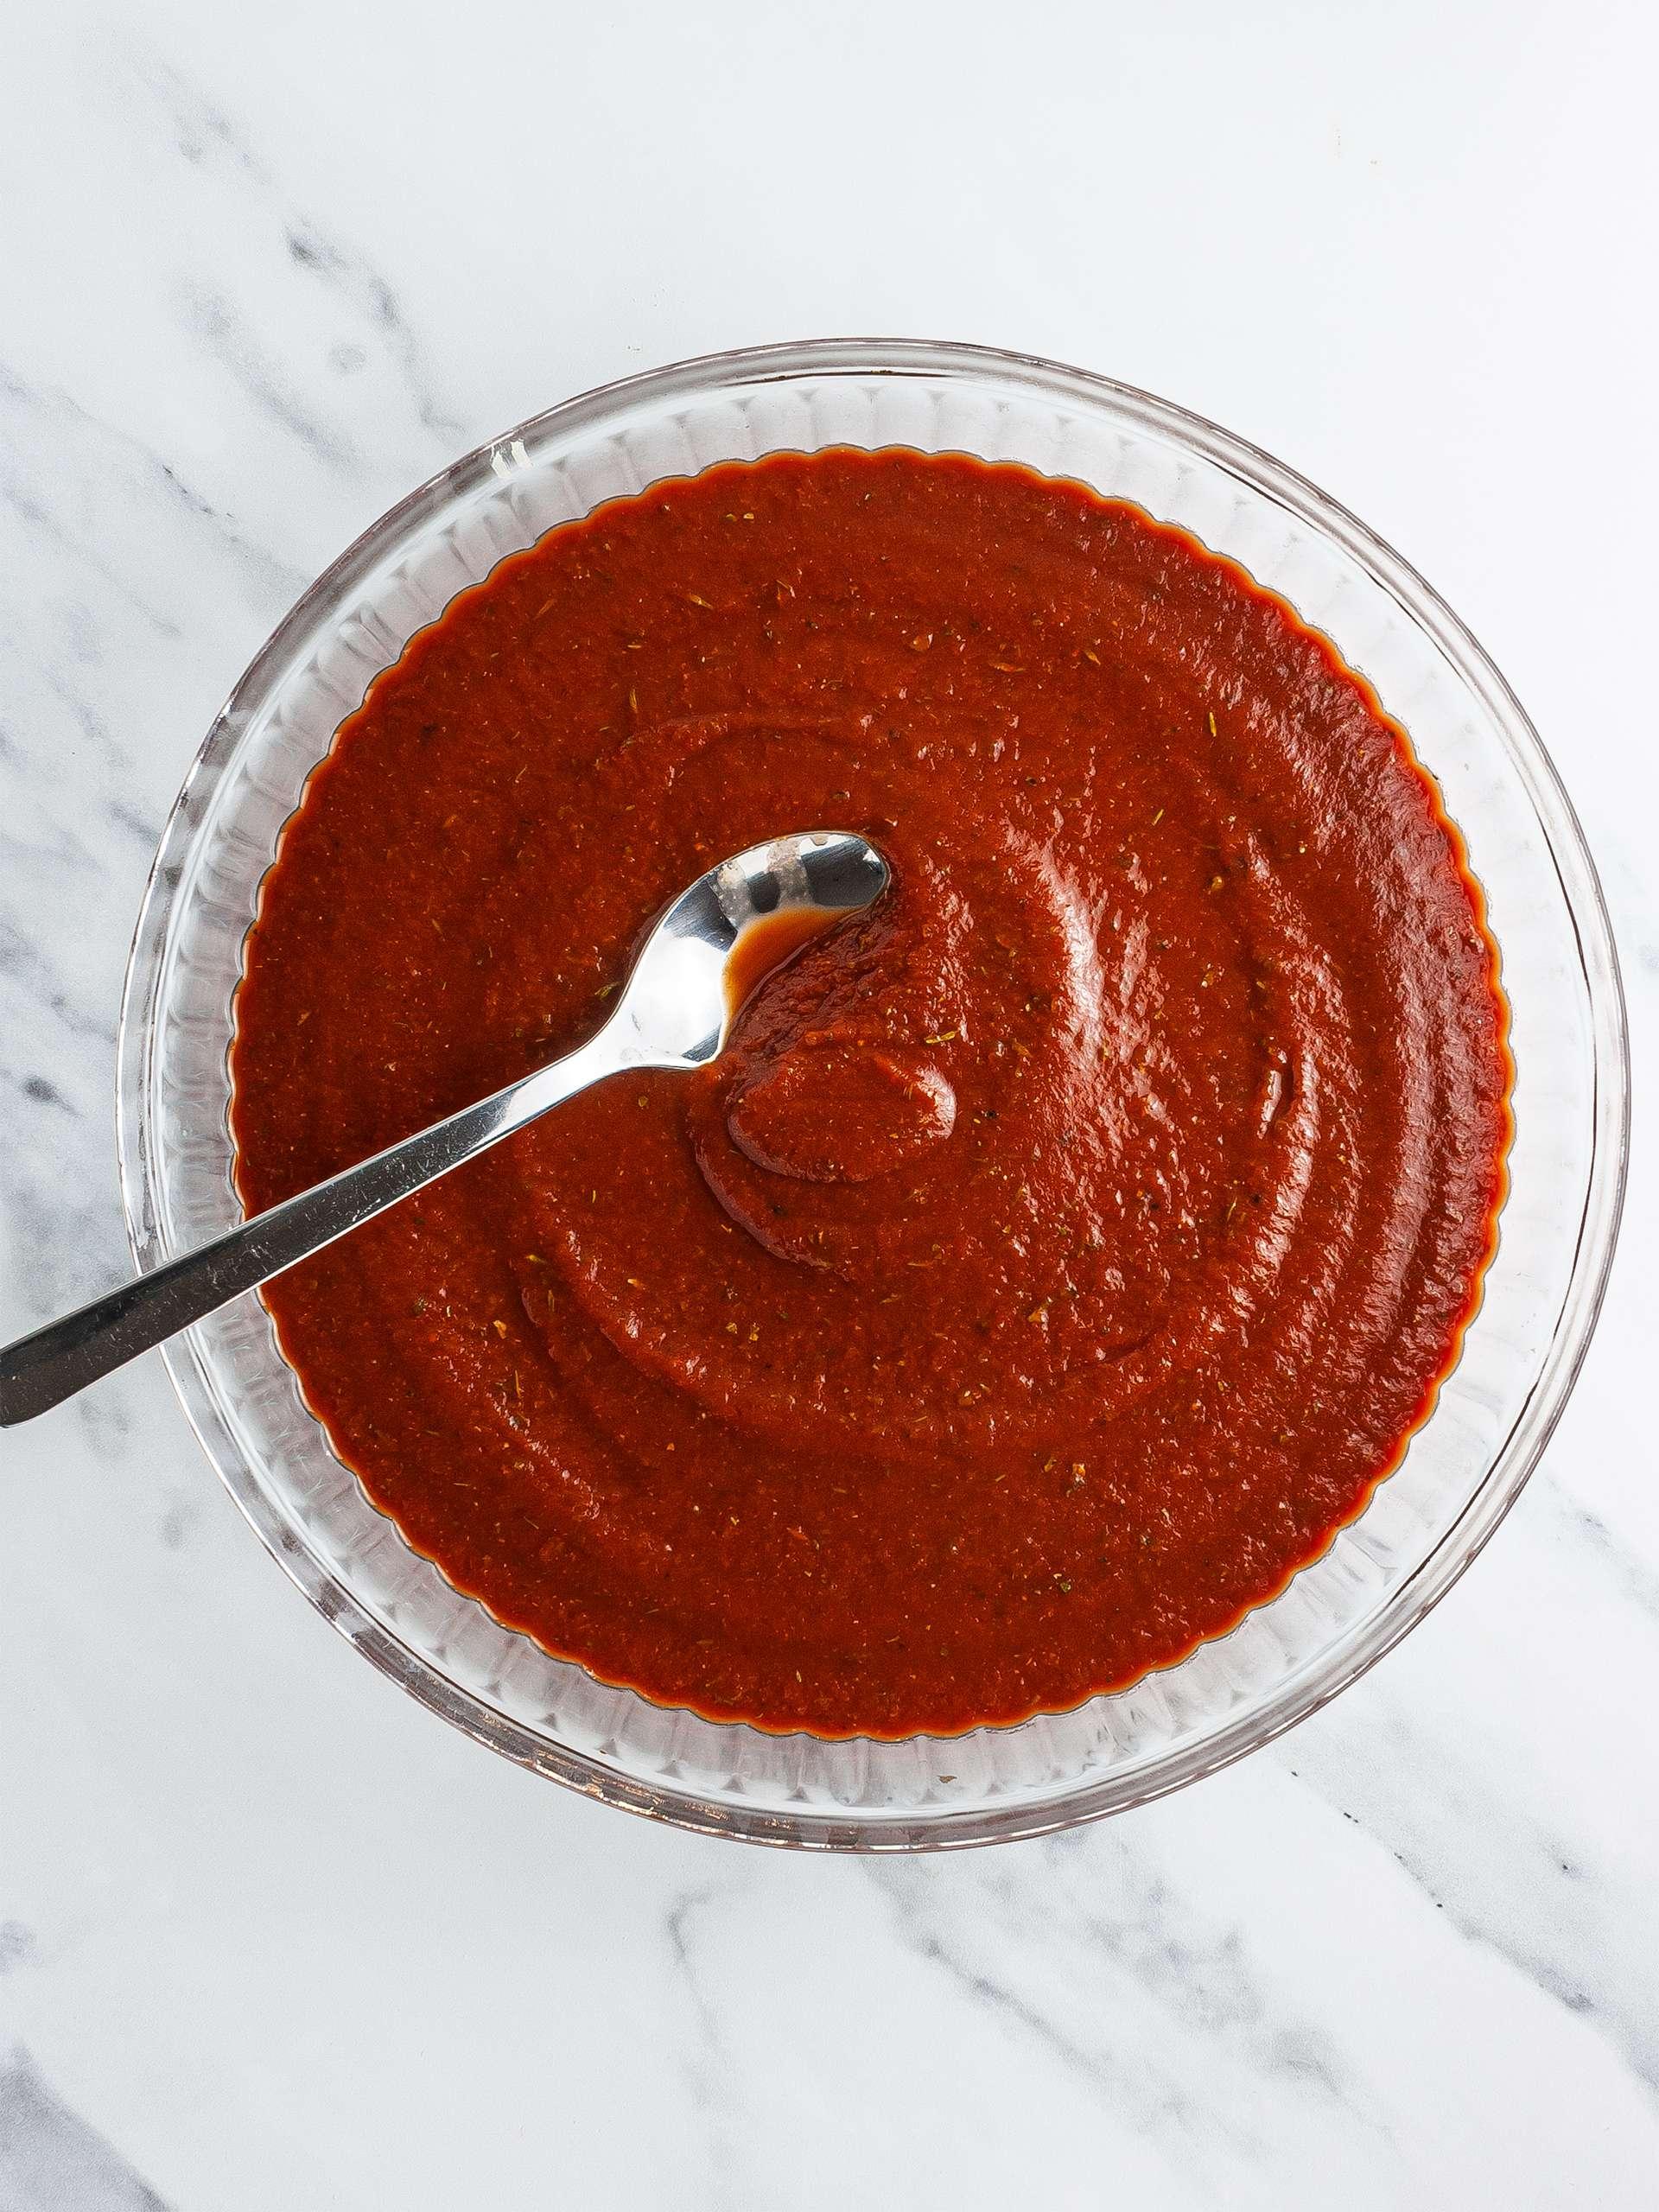 Tomato sauce spread over a baking dish